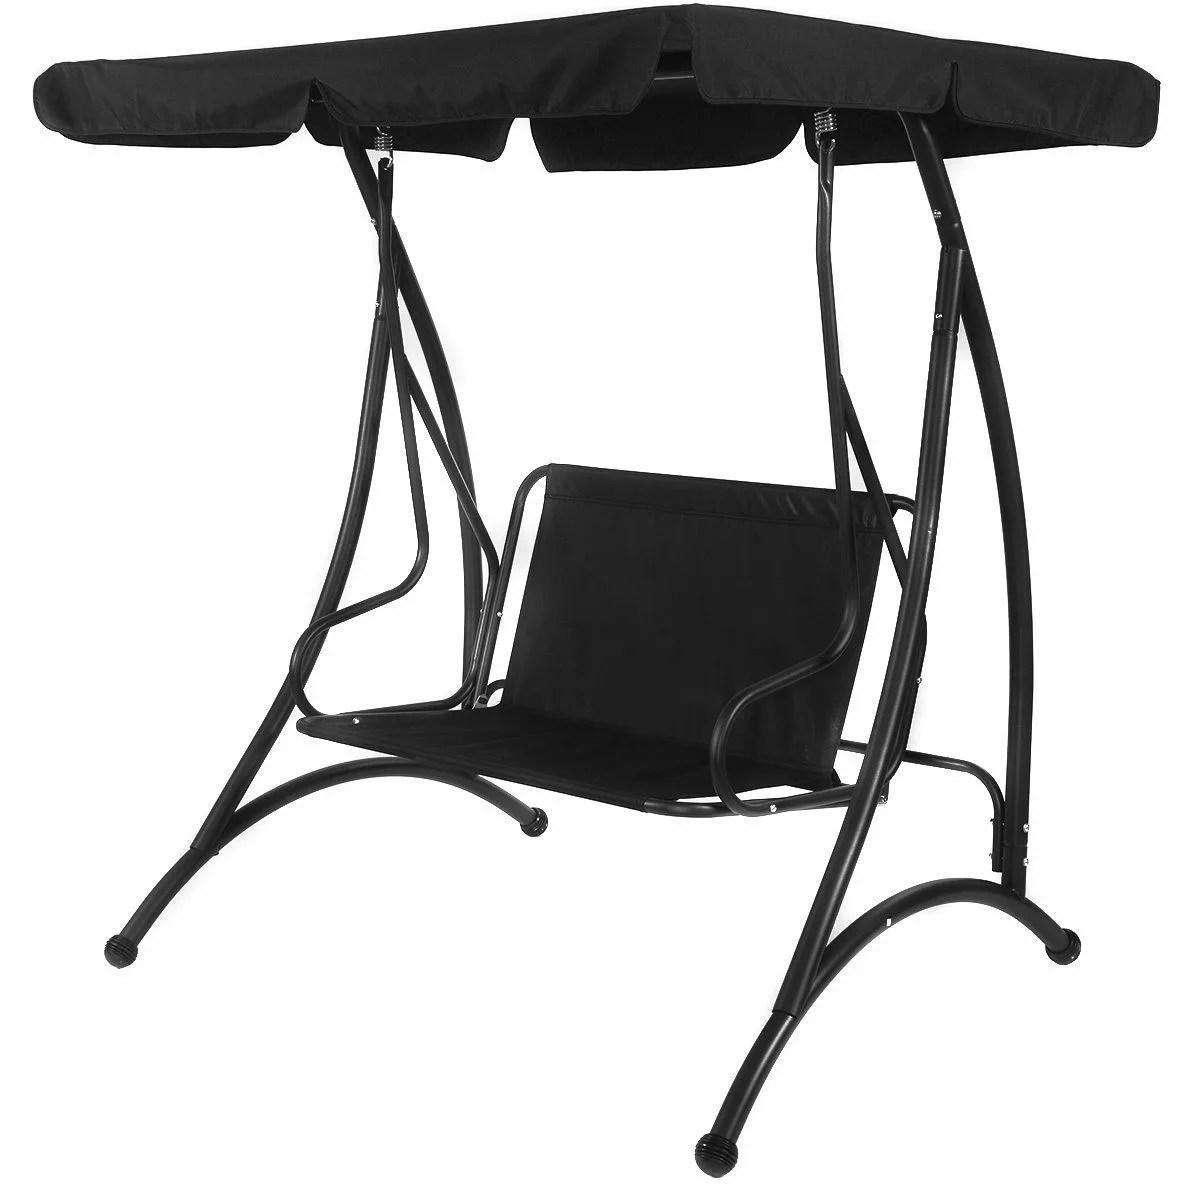 swing chair metal plastic school chairs costway black 2 person canopy patio hammock seat cushioned furniture steel